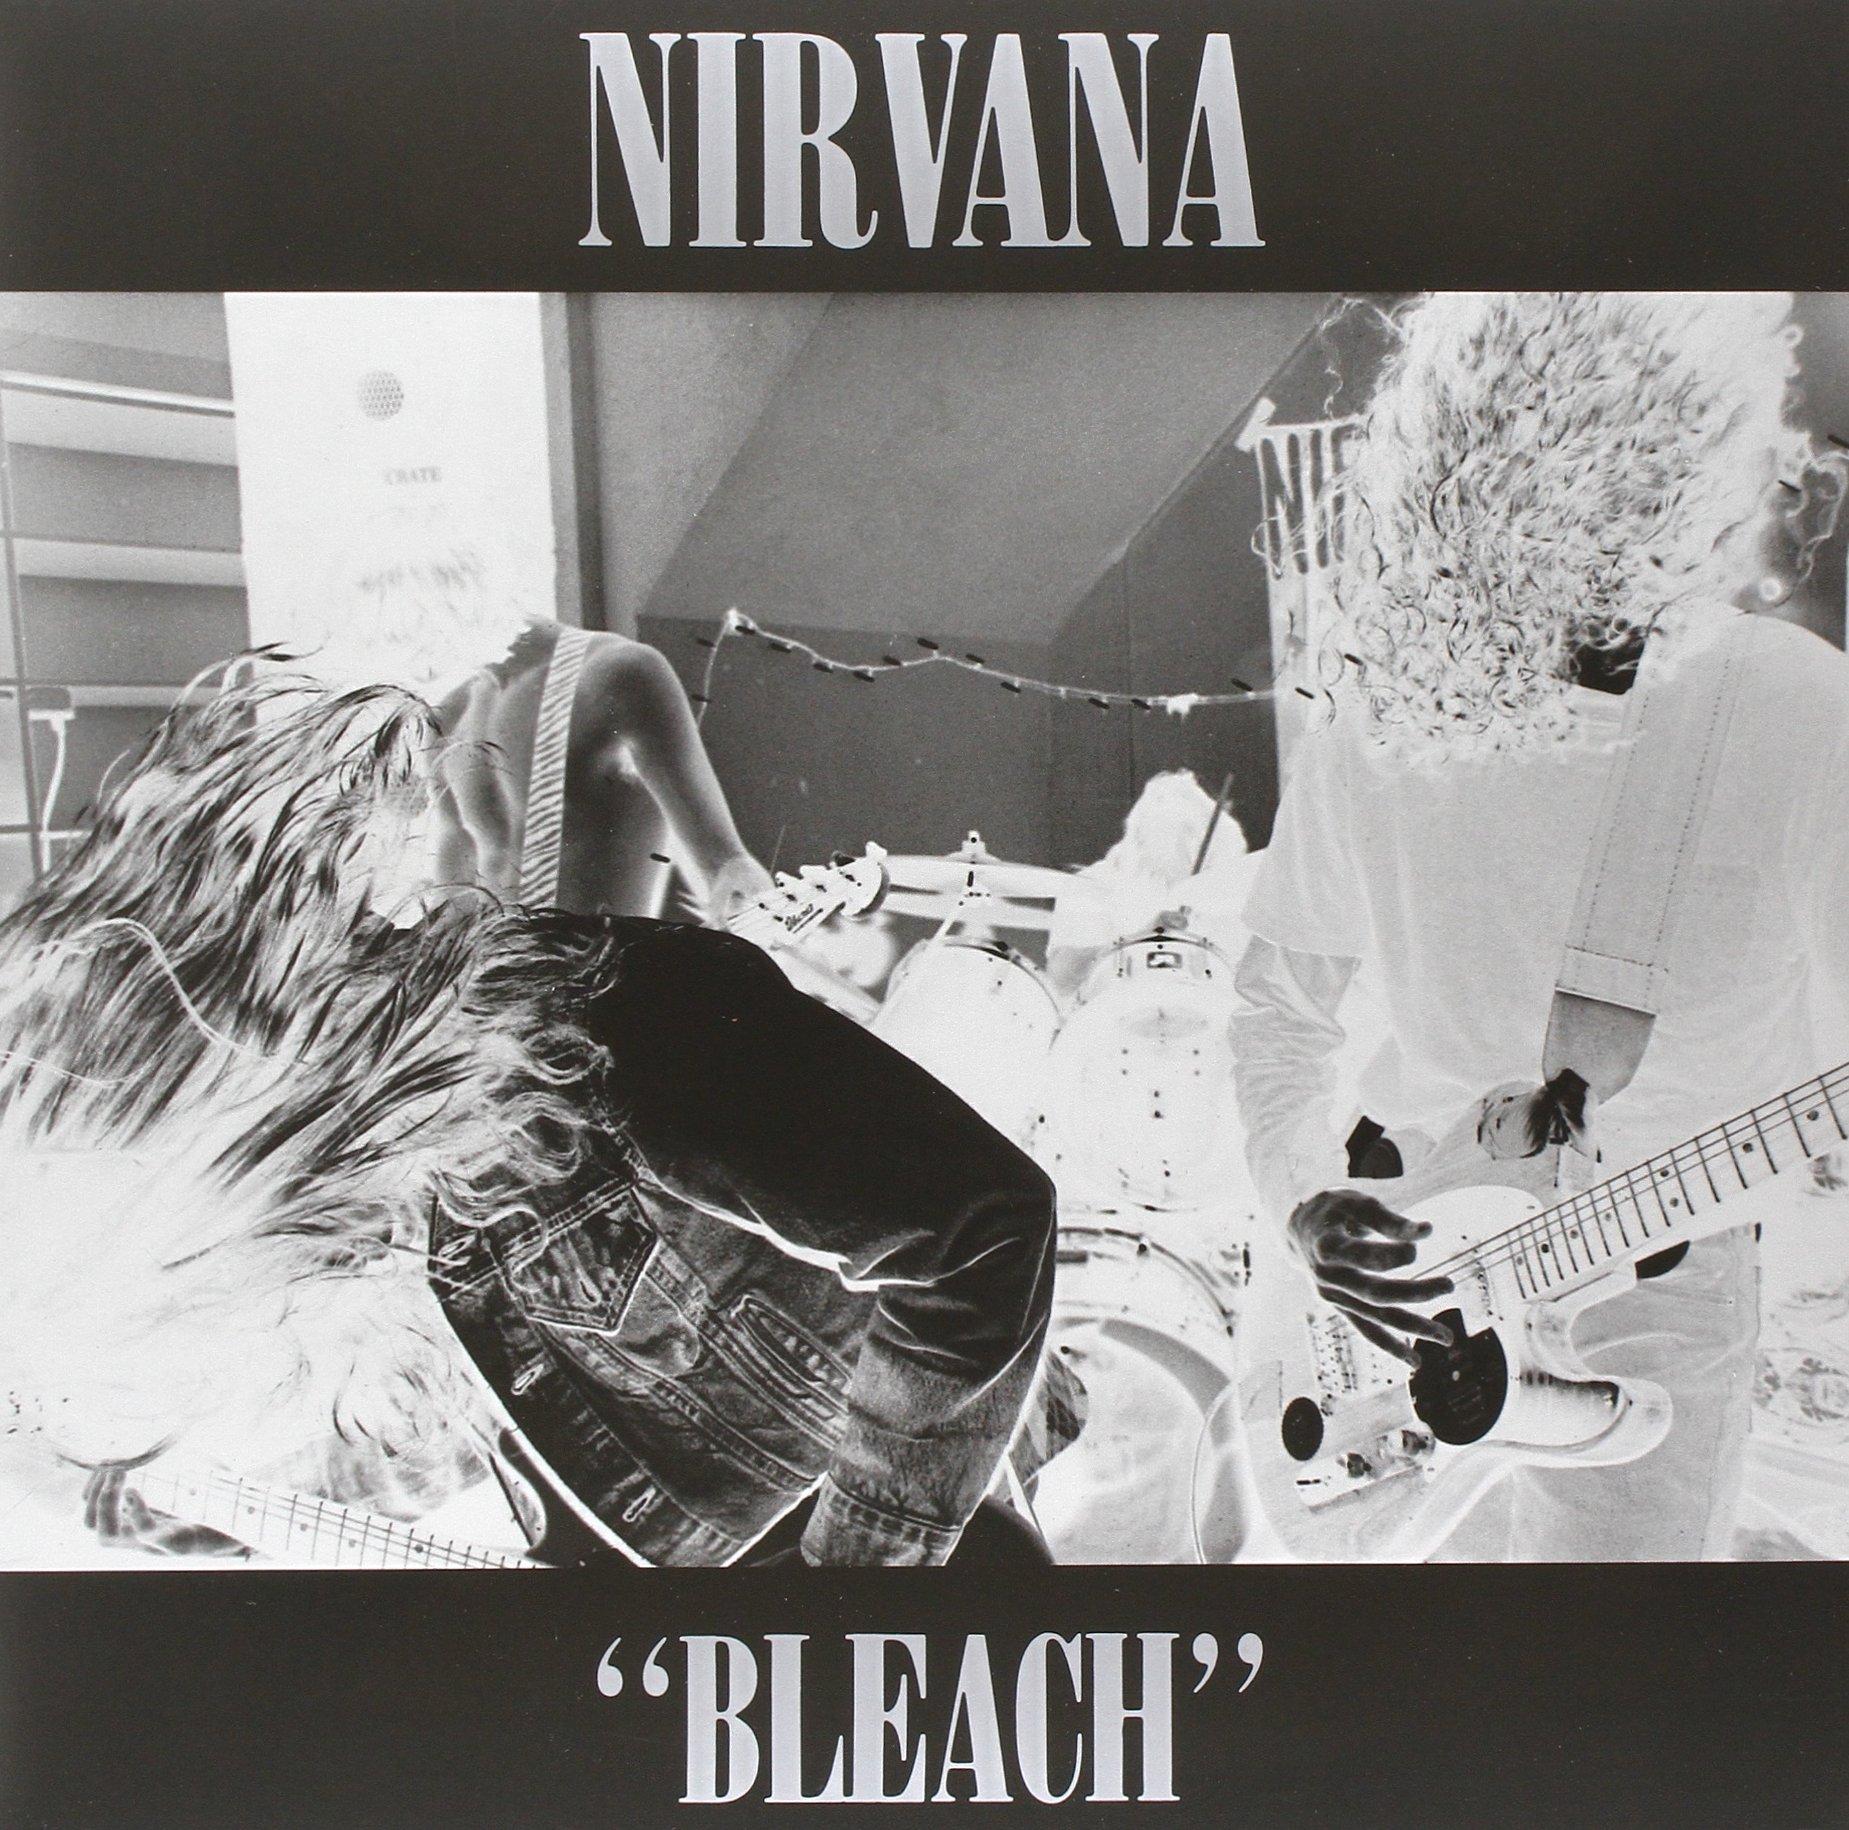 Vinilo : Nirvana - Bleach (Remastered, Digital Download Card)